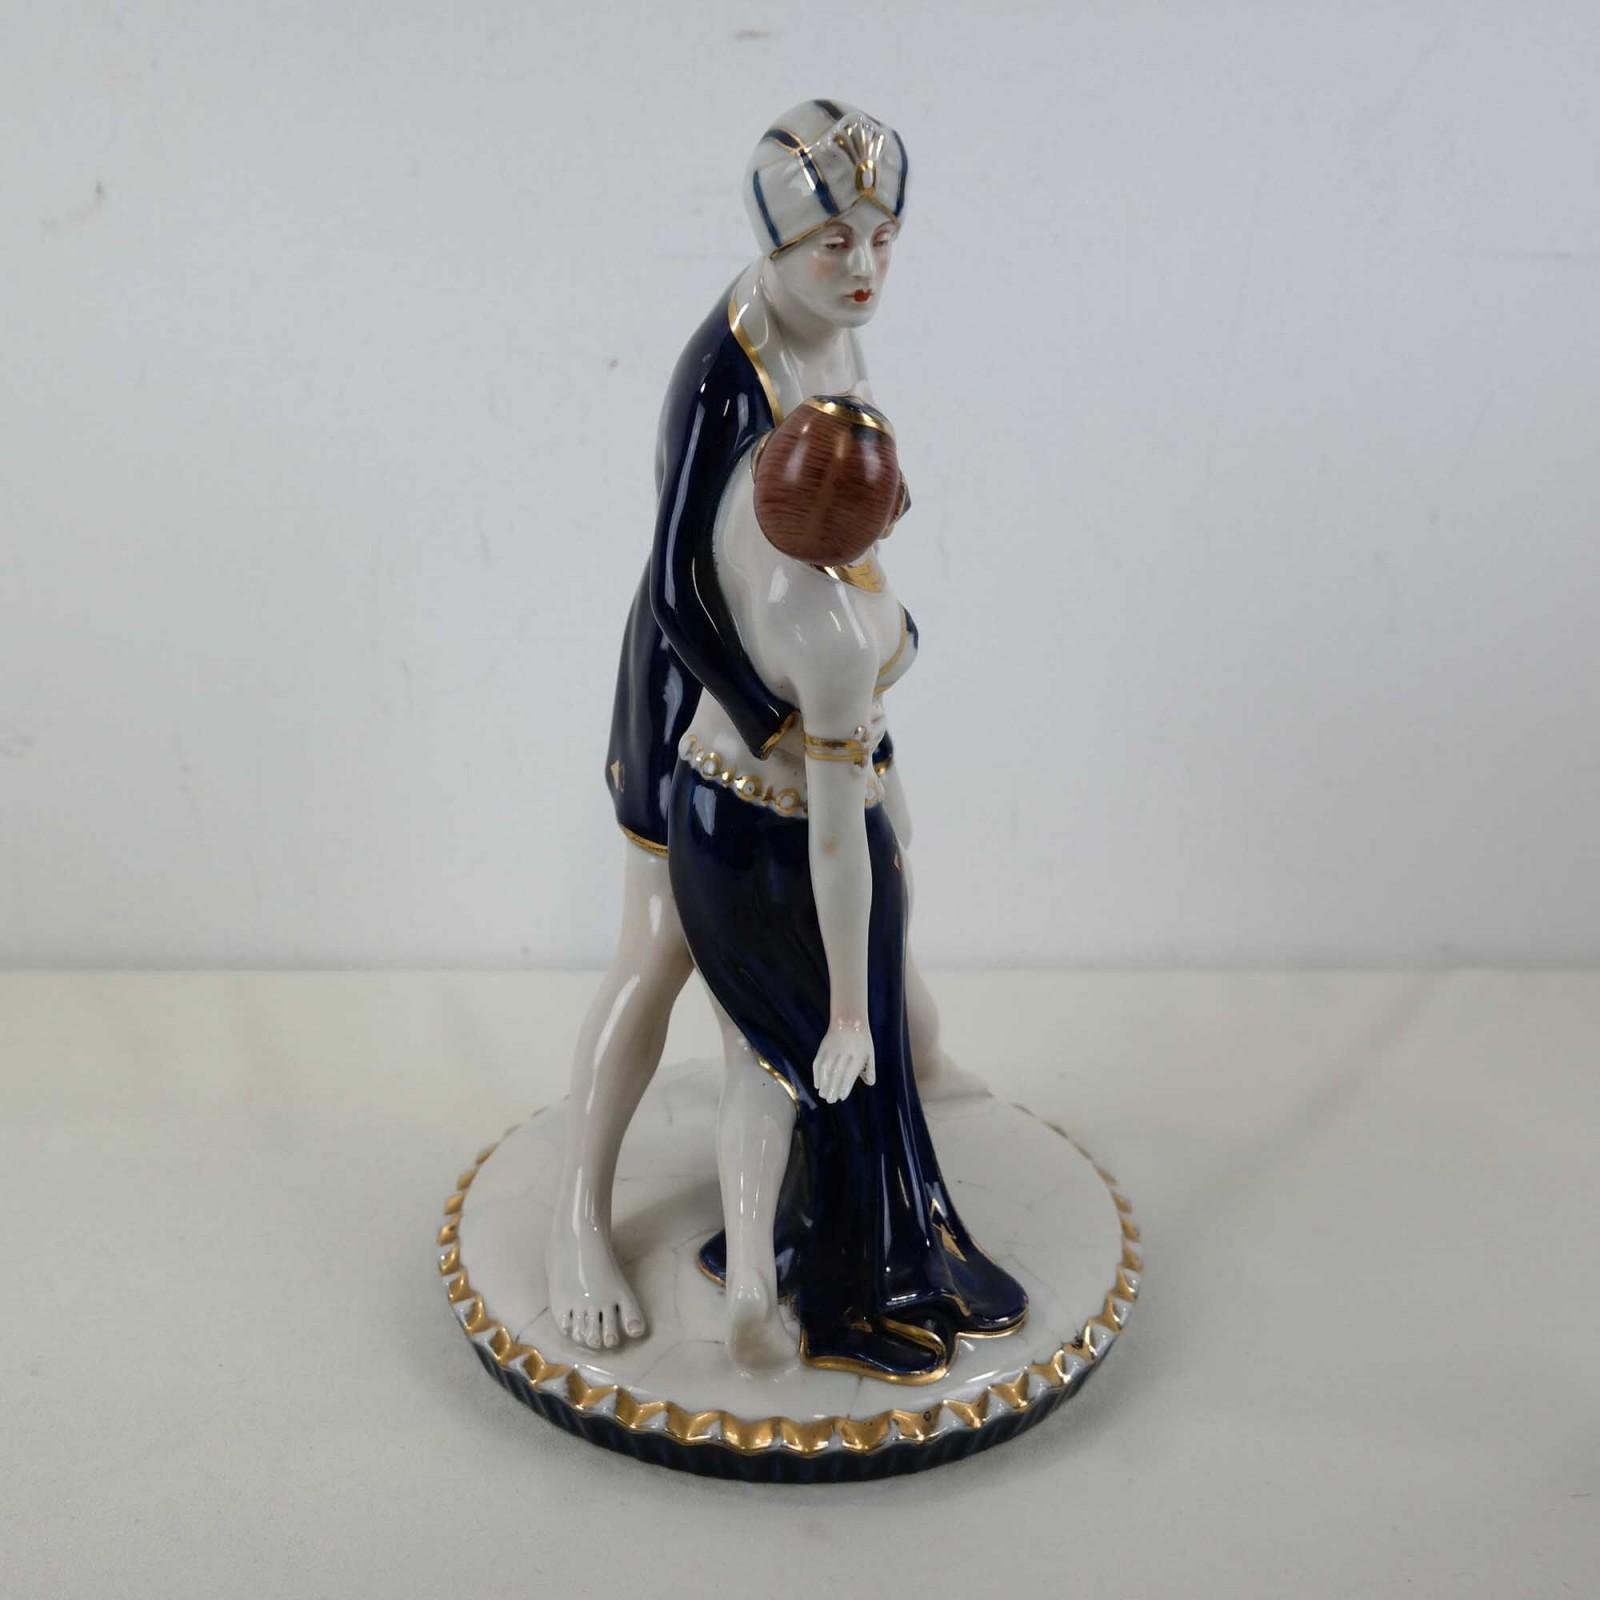 Art Deco Rudolph Valentino en Vilma Bank Royal Dux